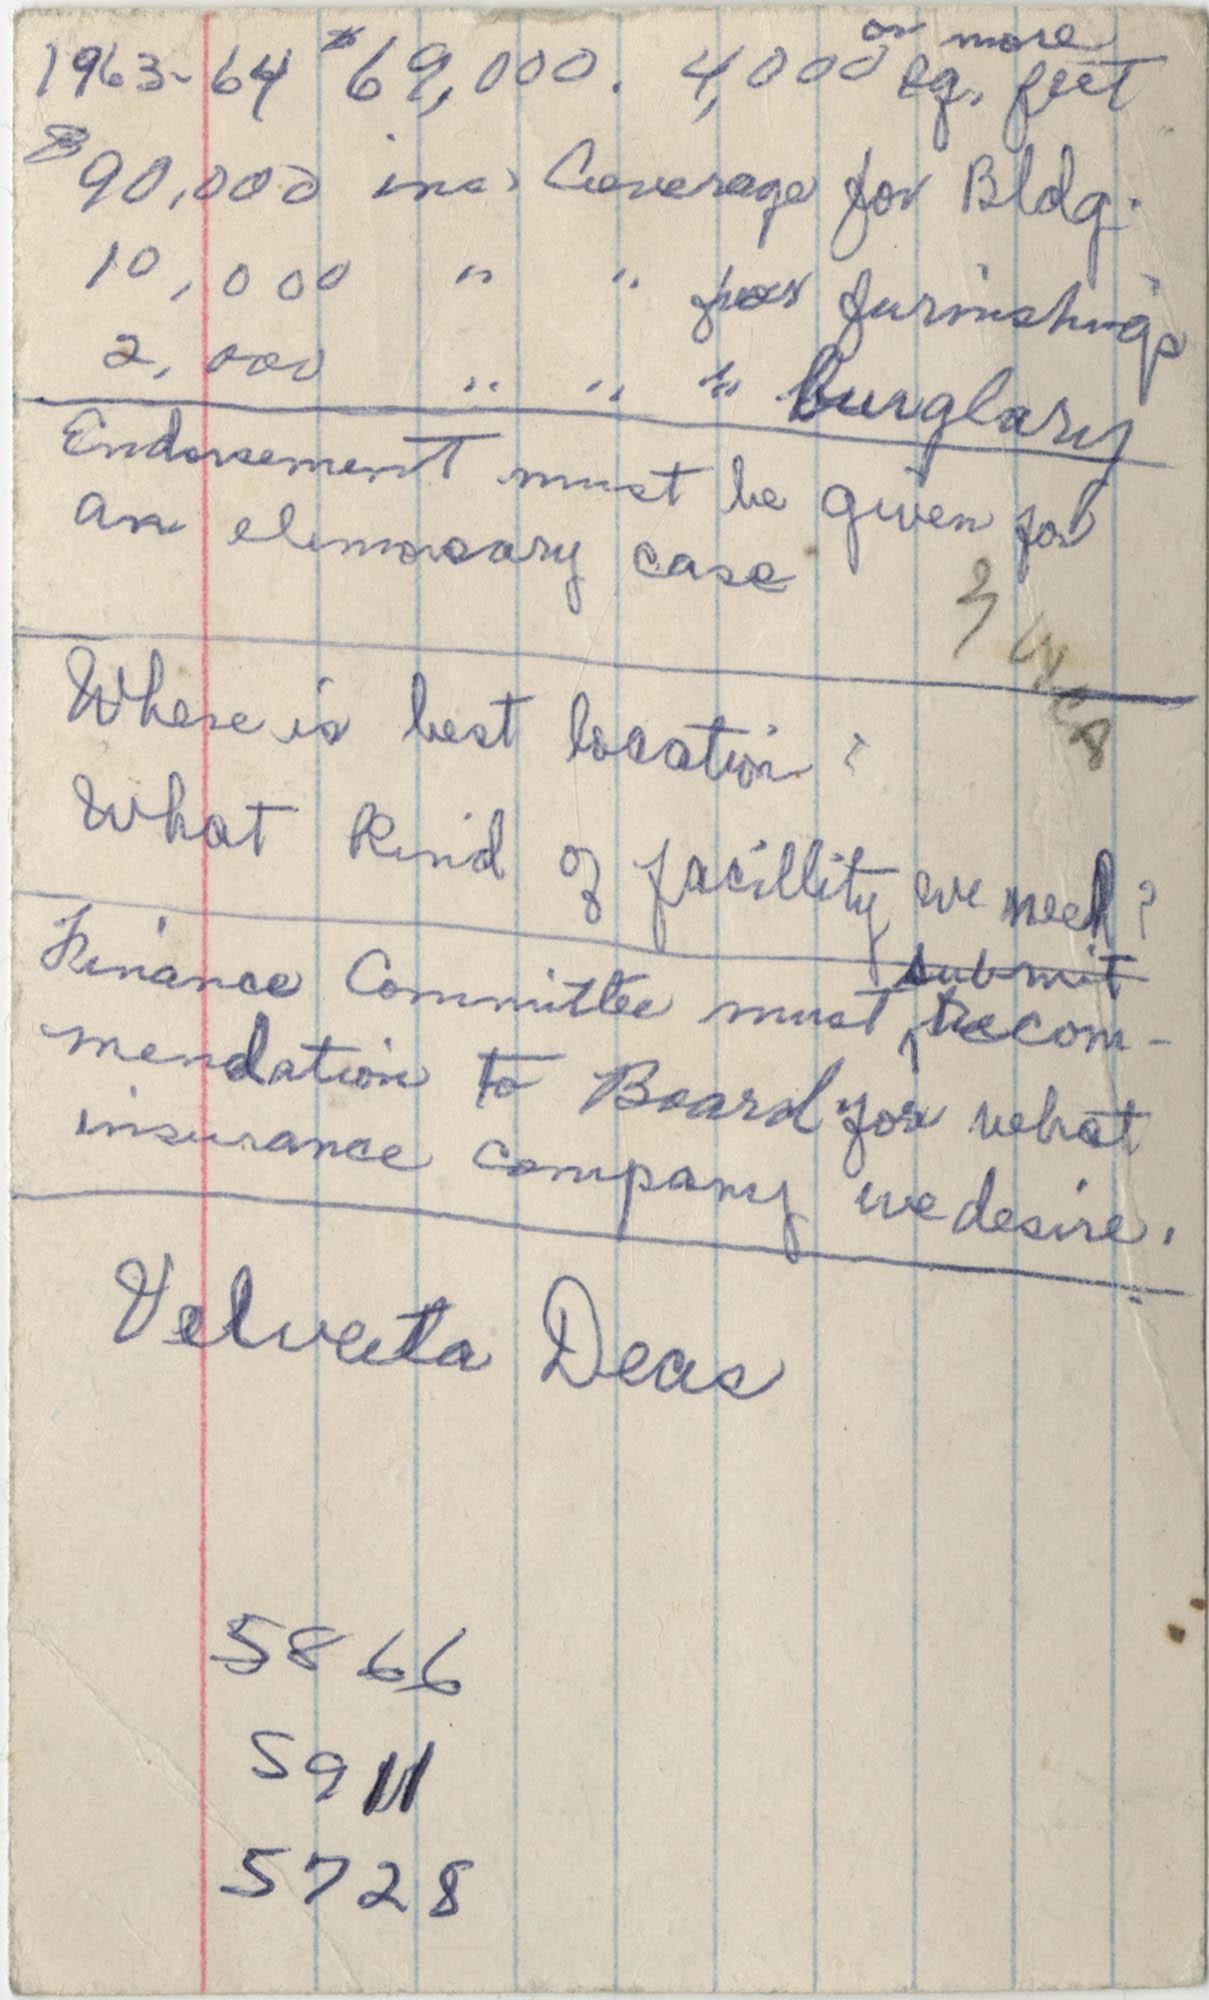 Bernice Robinson's 1973 Pocket Secretary, Loose Notecard Back